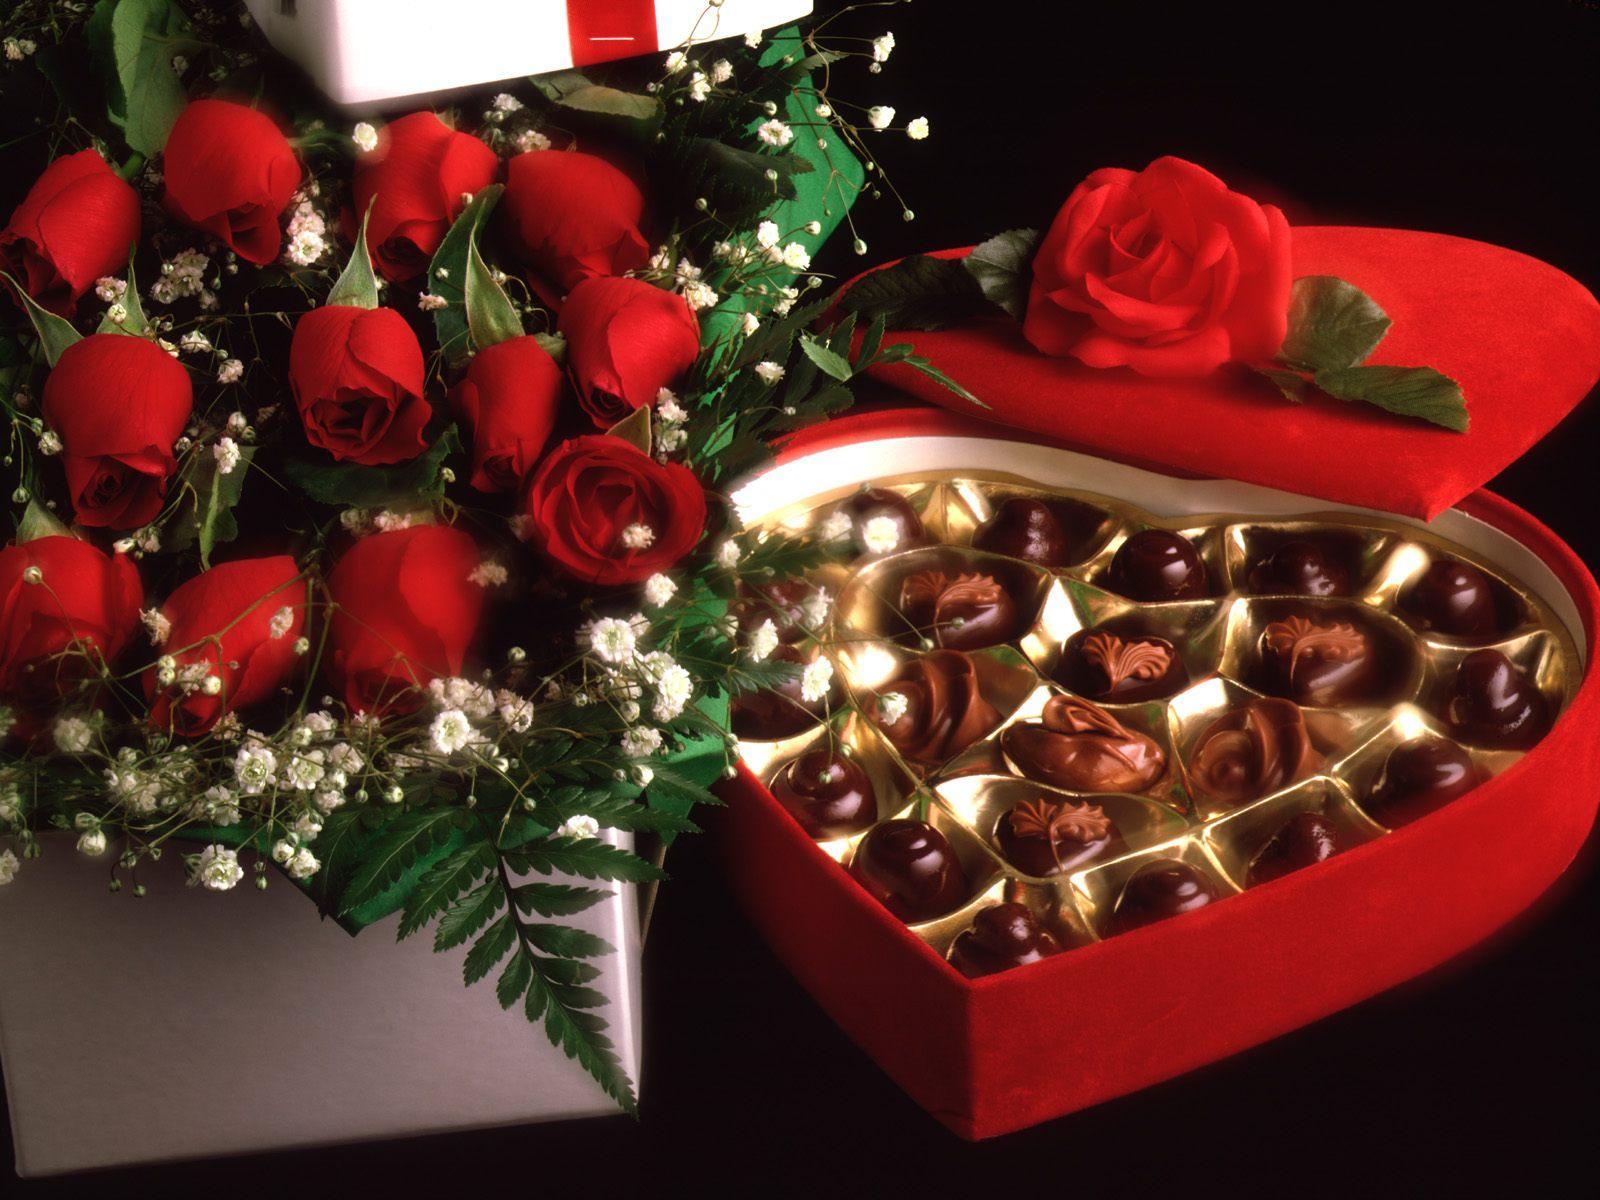 http://2.bp.blogspot.com/-VCrxoNXAAxY/Tq6dPTf2gQI/AAAAAAAAA-8/hf-011b2svE/s1600/Valentines-Day-Wallpaper-.jpg